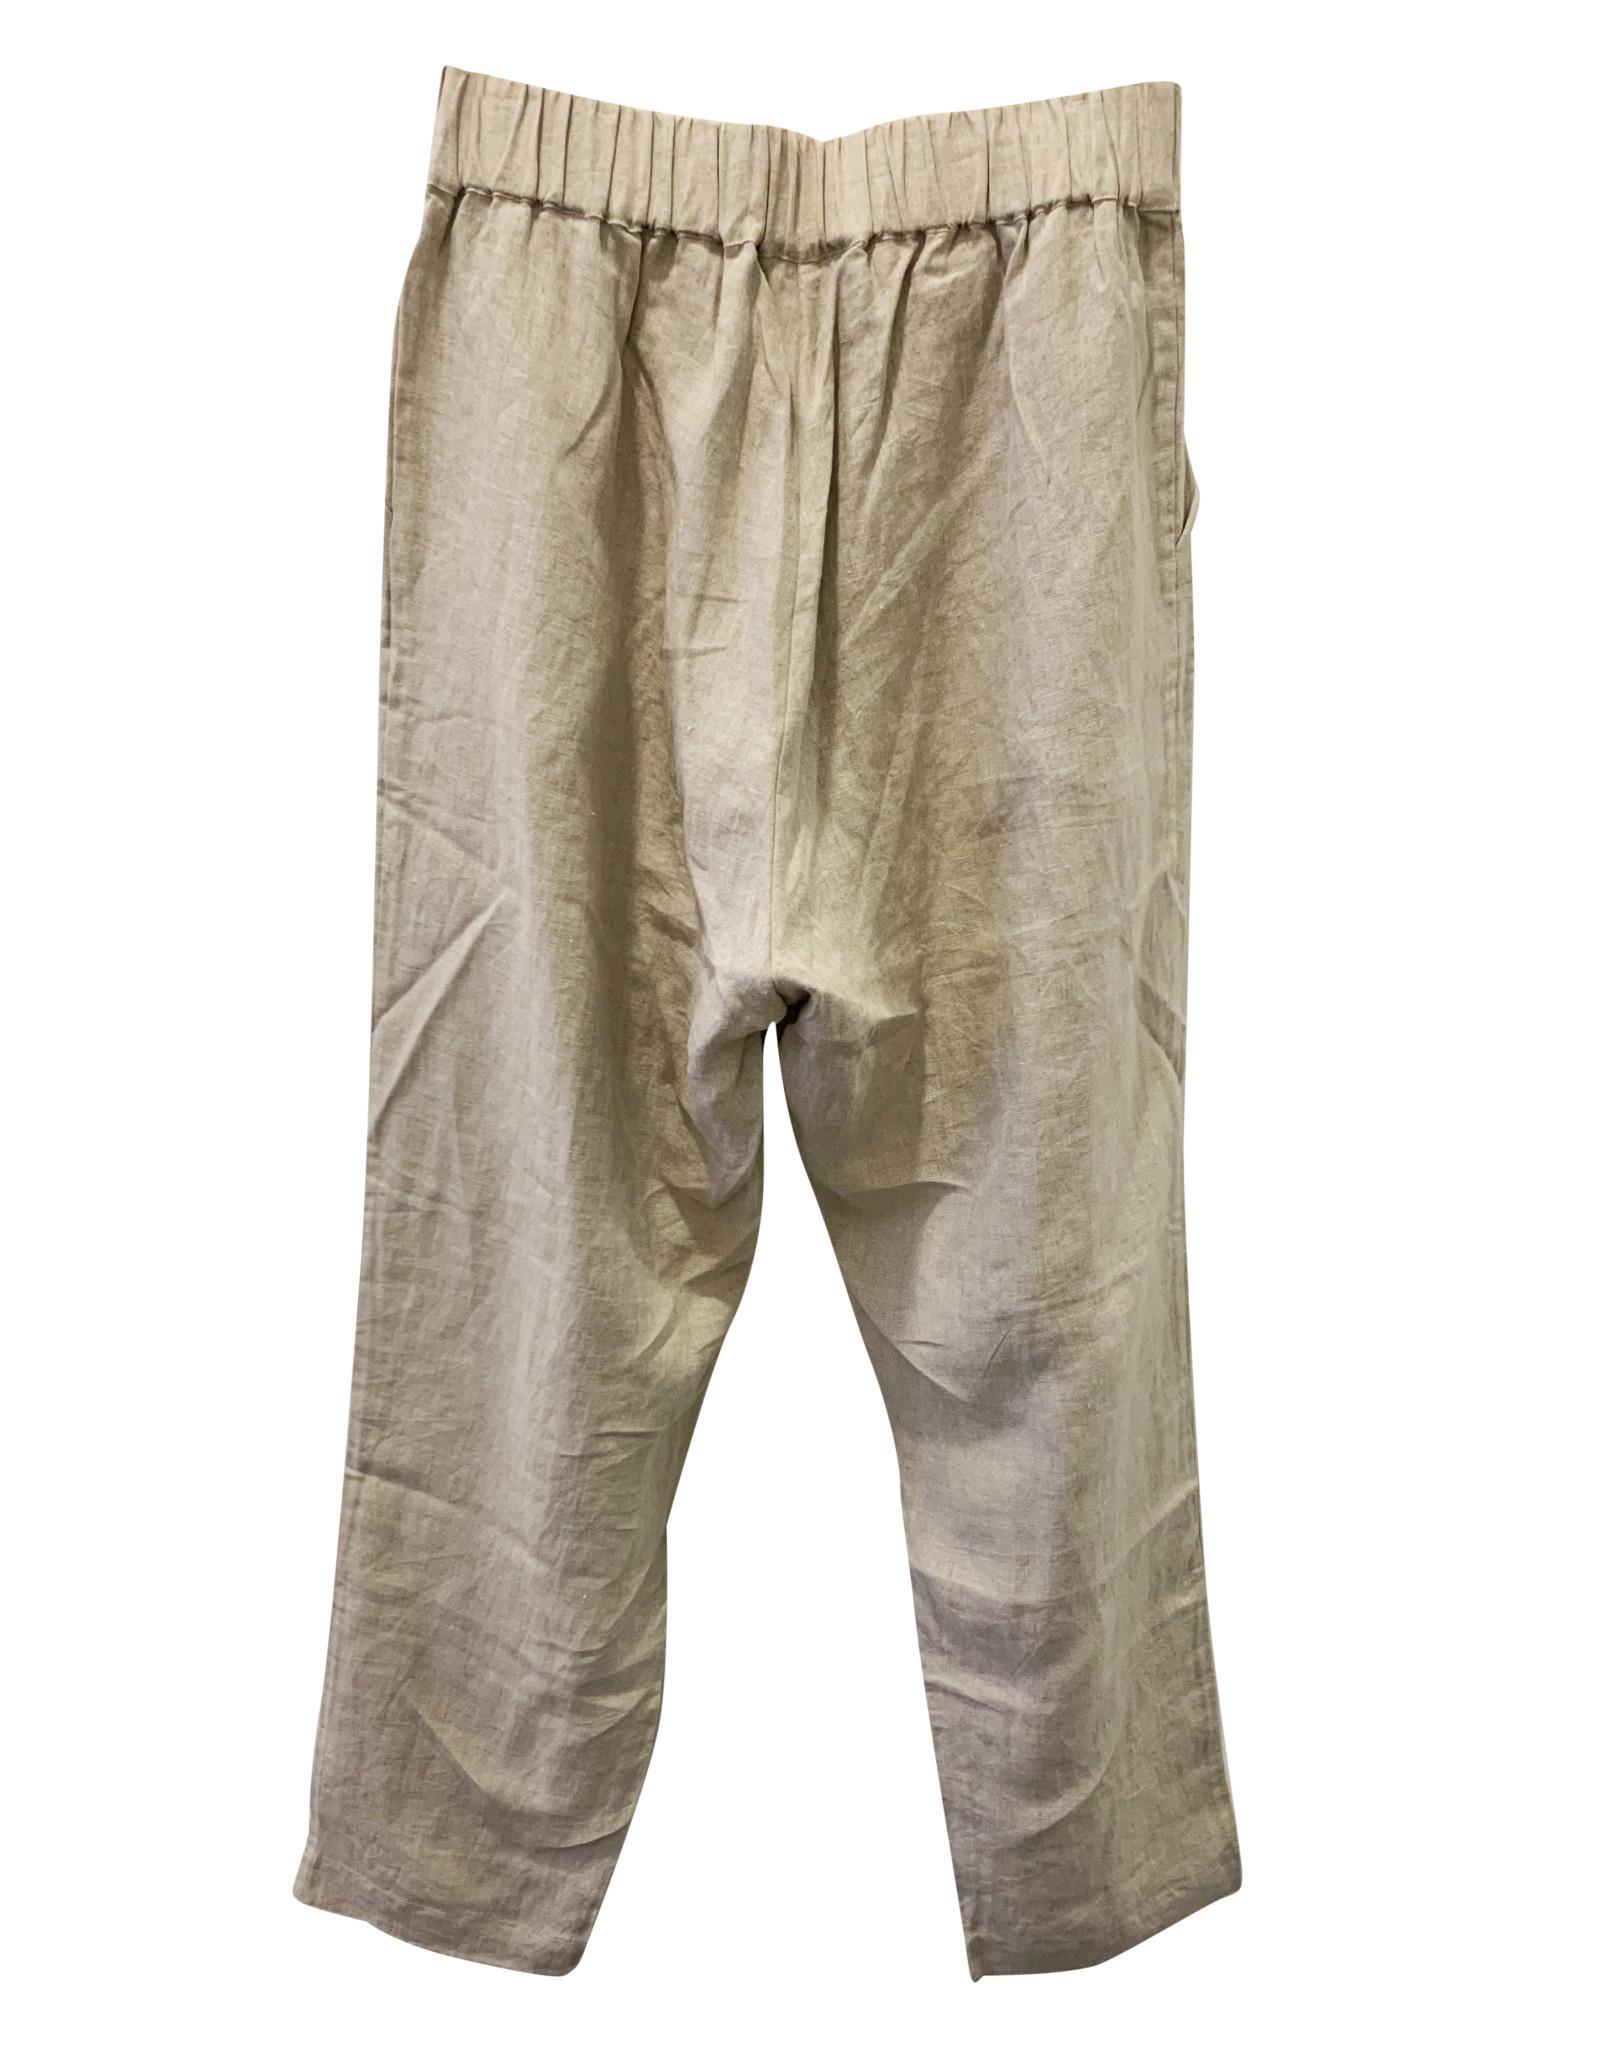 Avenue Avenue Cream Linen Pants